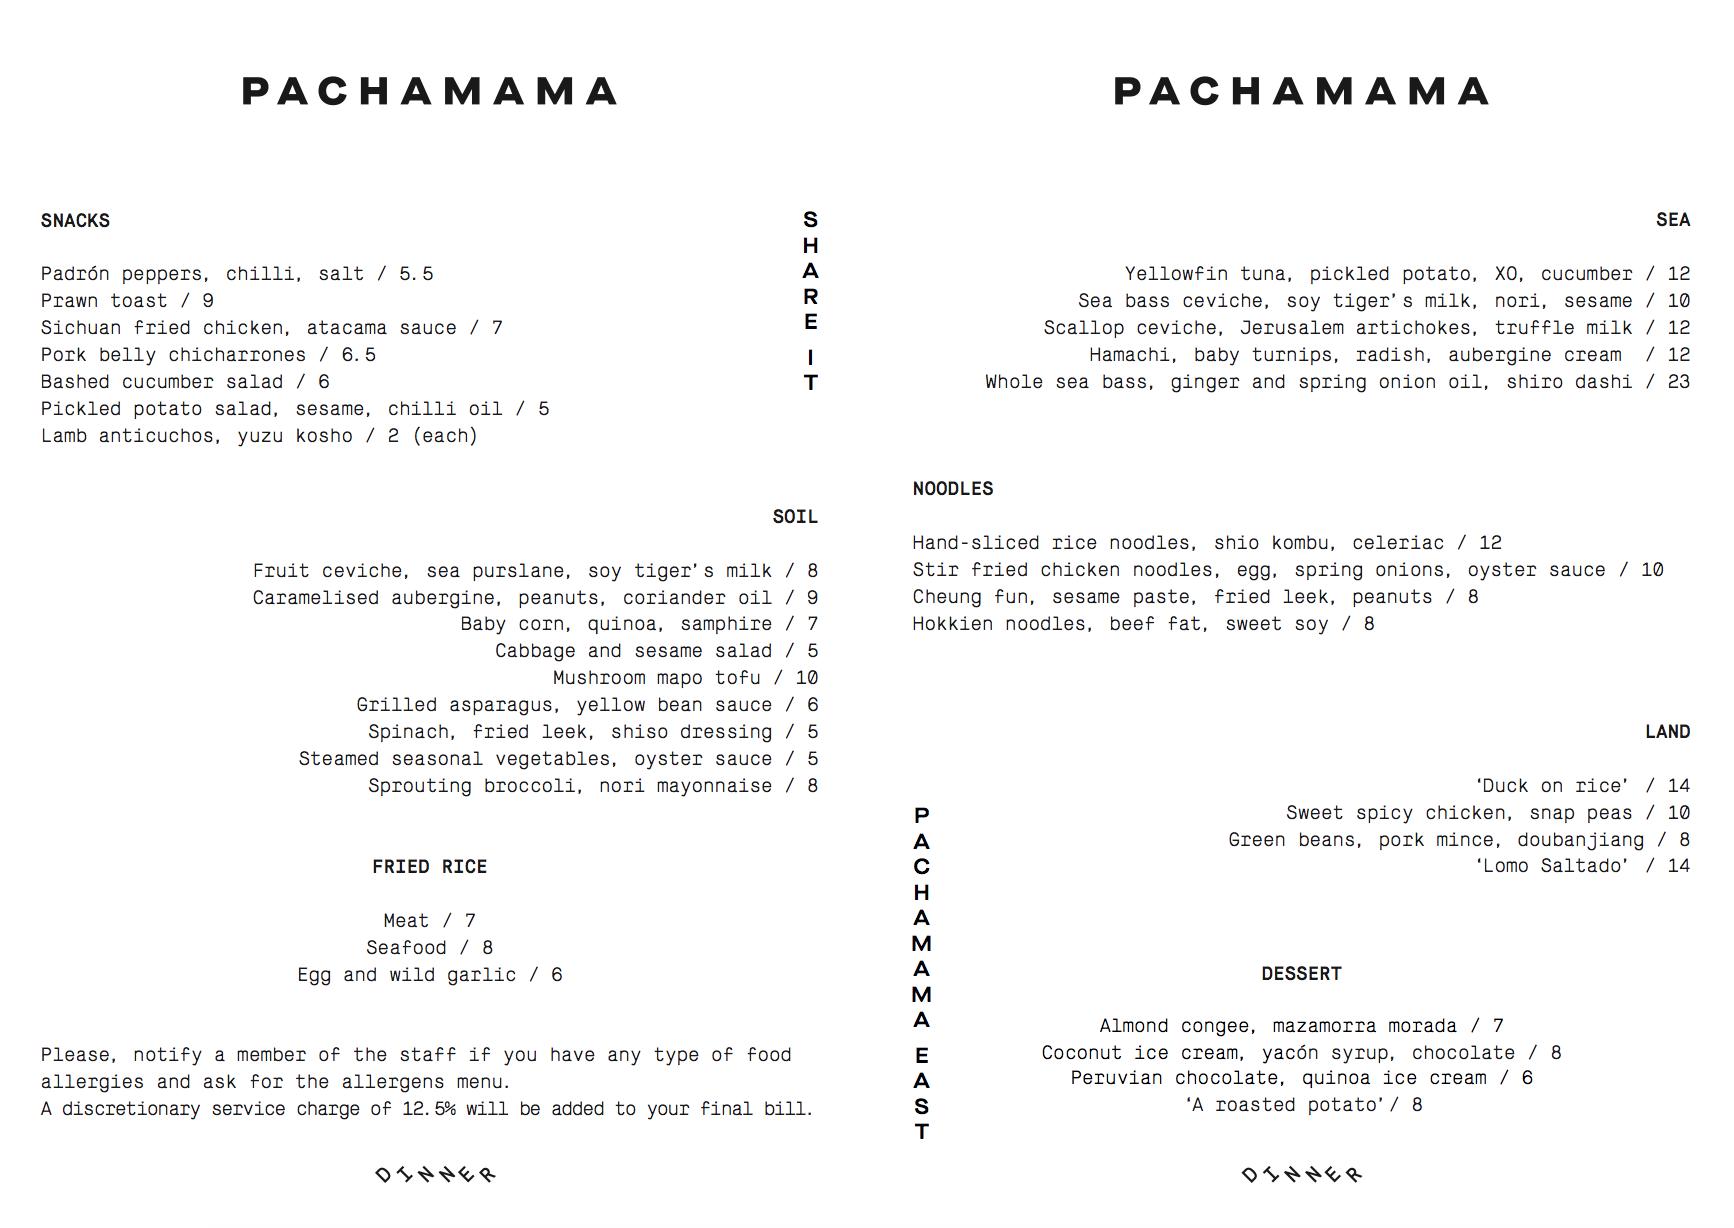 Pachamama East Sample Menu